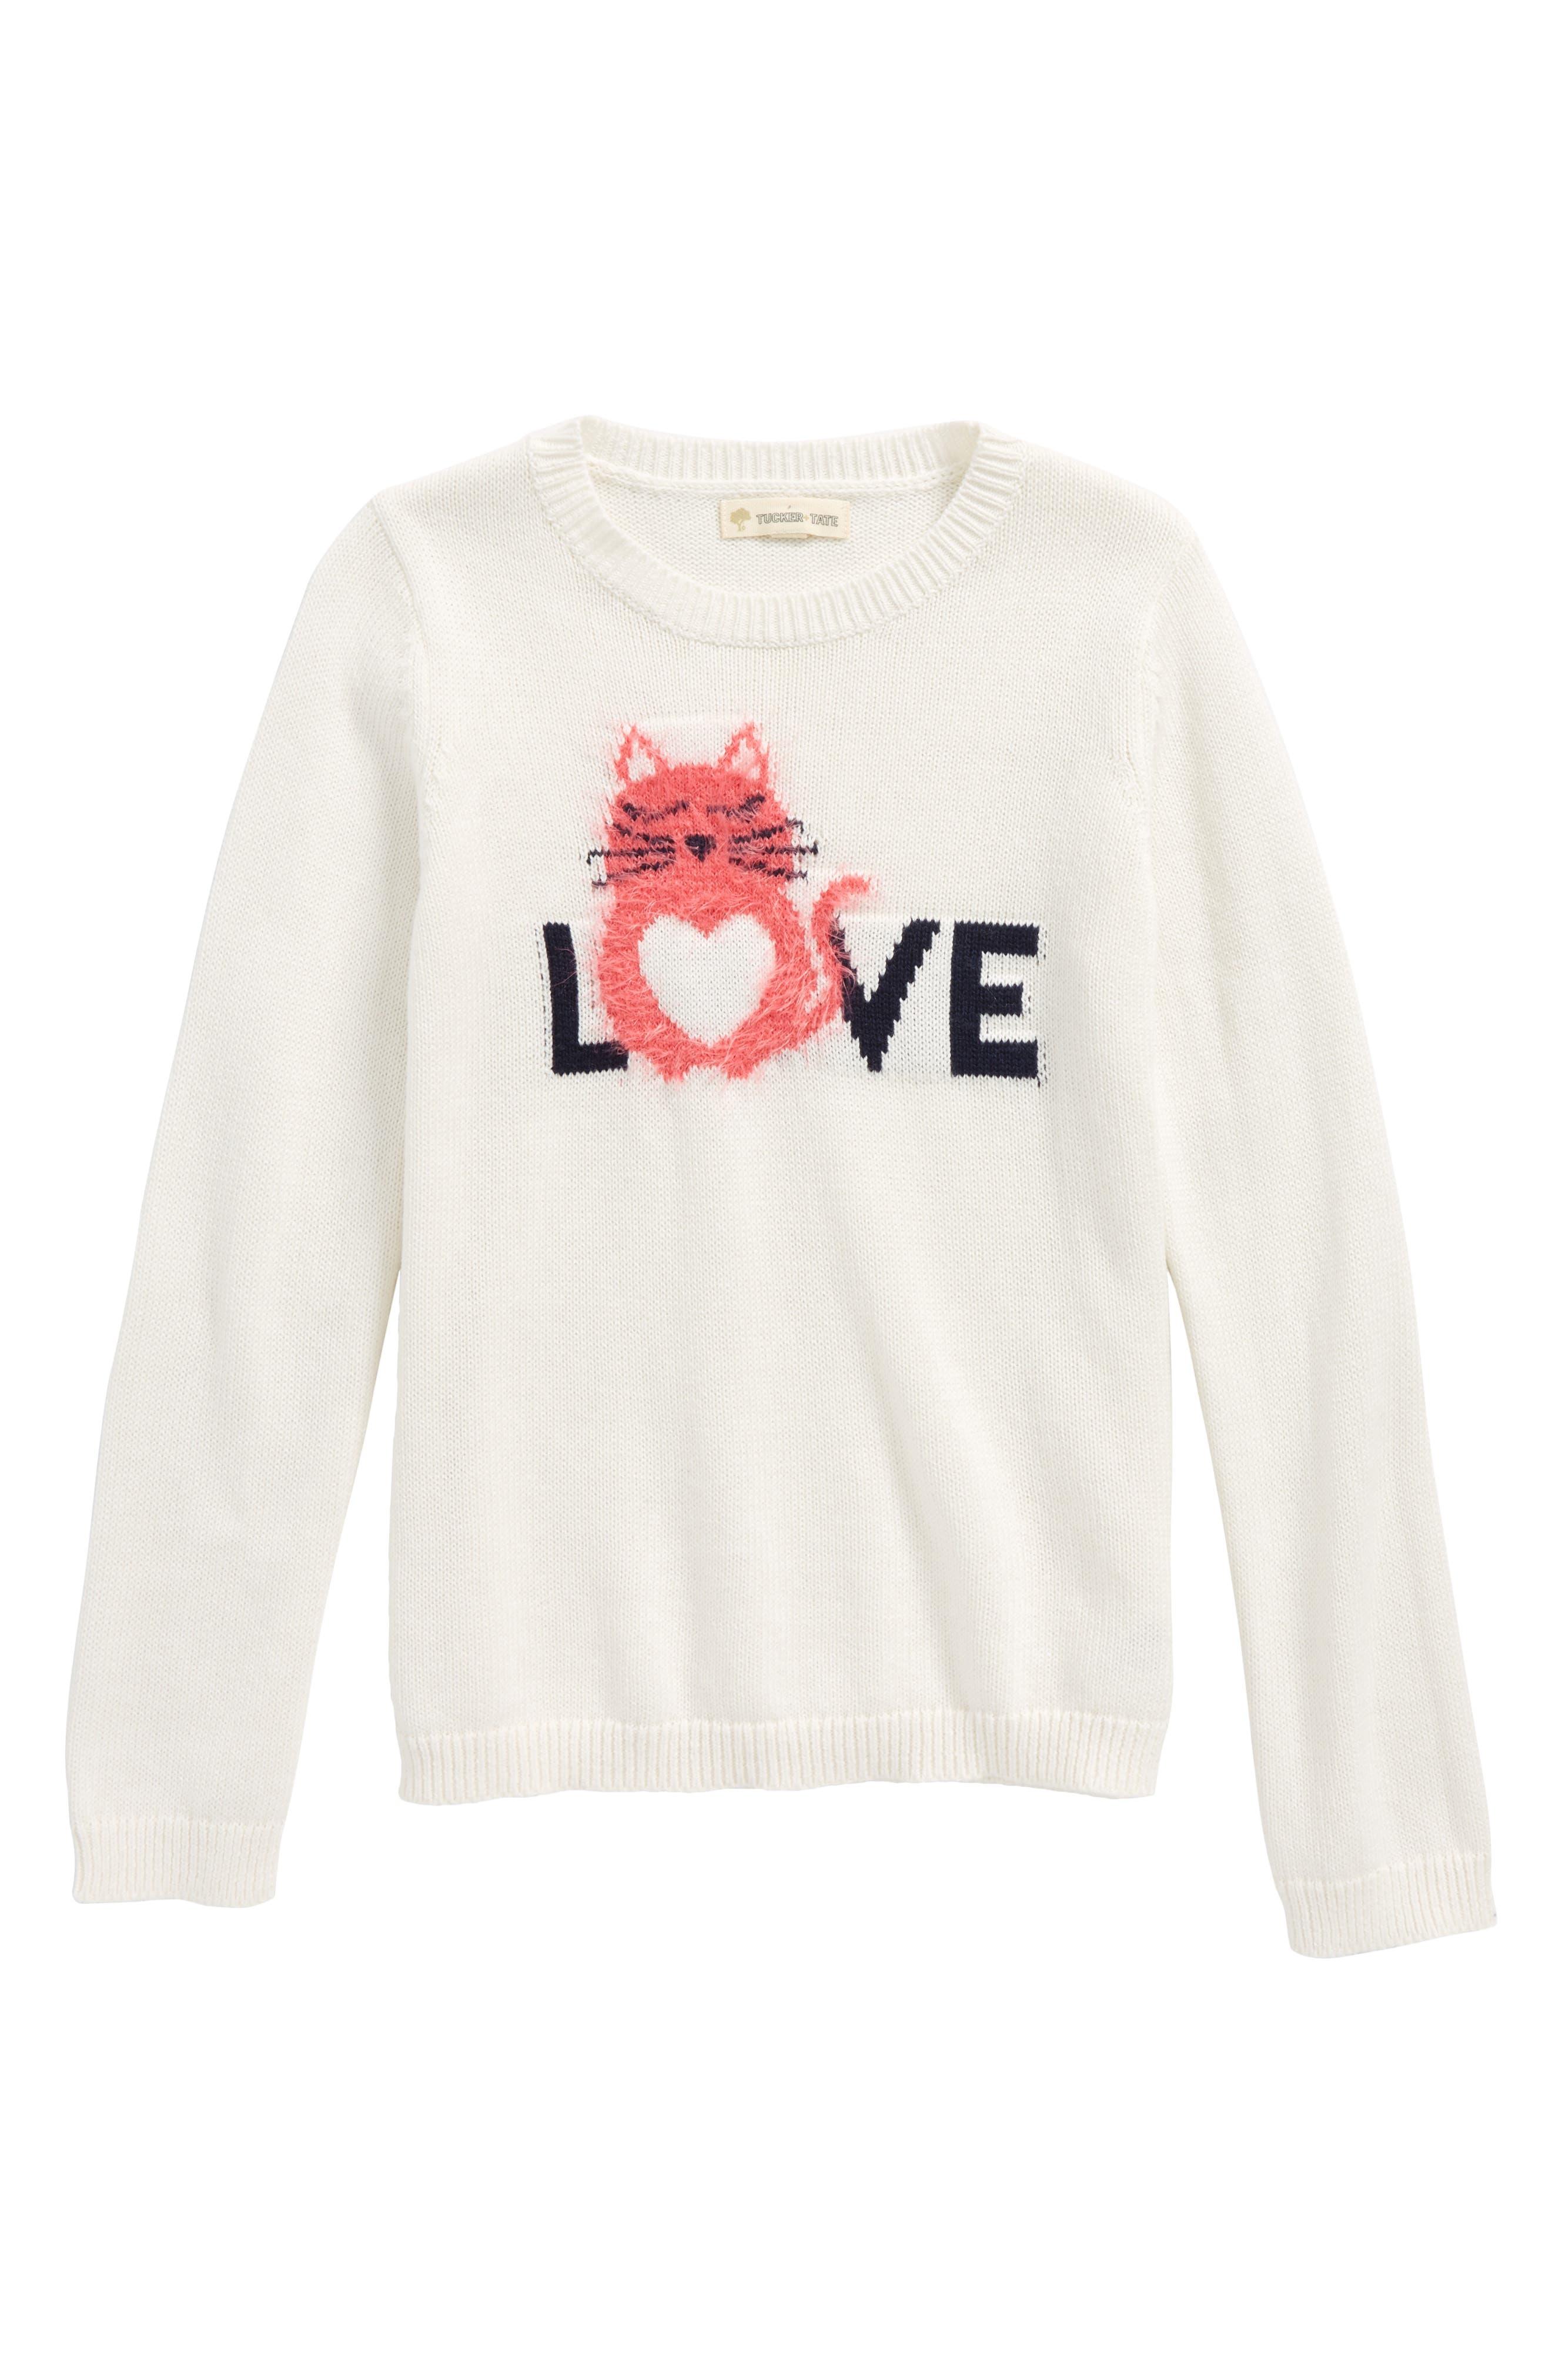 Tucker + Tate Cotton & Cashmere Sweater (Toddler Girls, Little Girls & Big Girls)